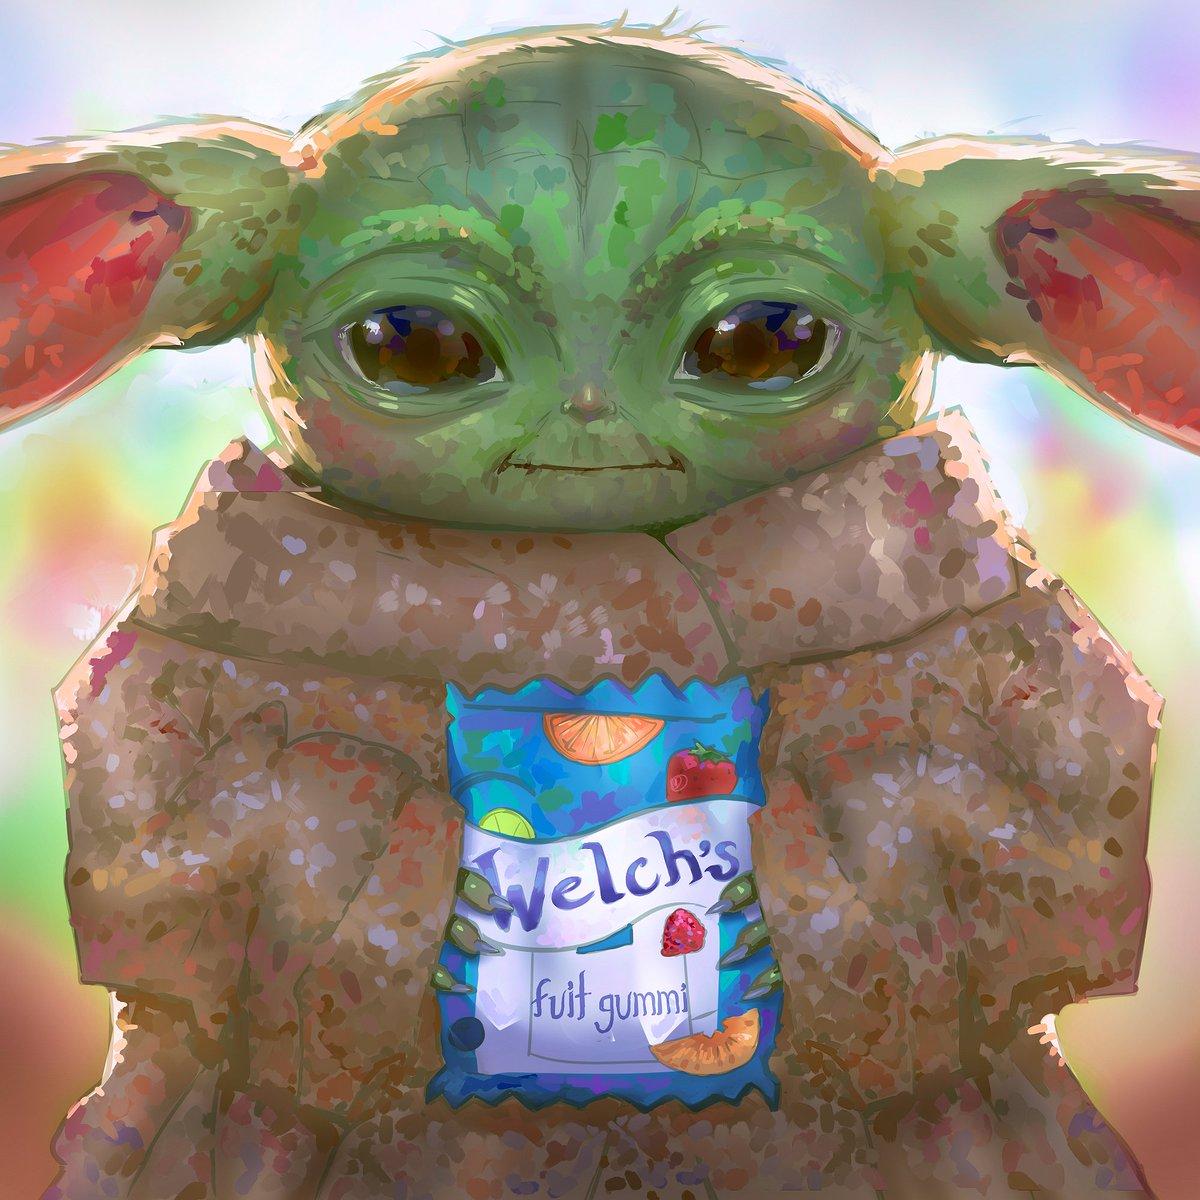 Maddie On Twitter Portrait Of Baby Yoda Holding Fuit Gummi 2019 To legendary meme status baby yoda ascended has. baby yoda holding fuit gummi 2019